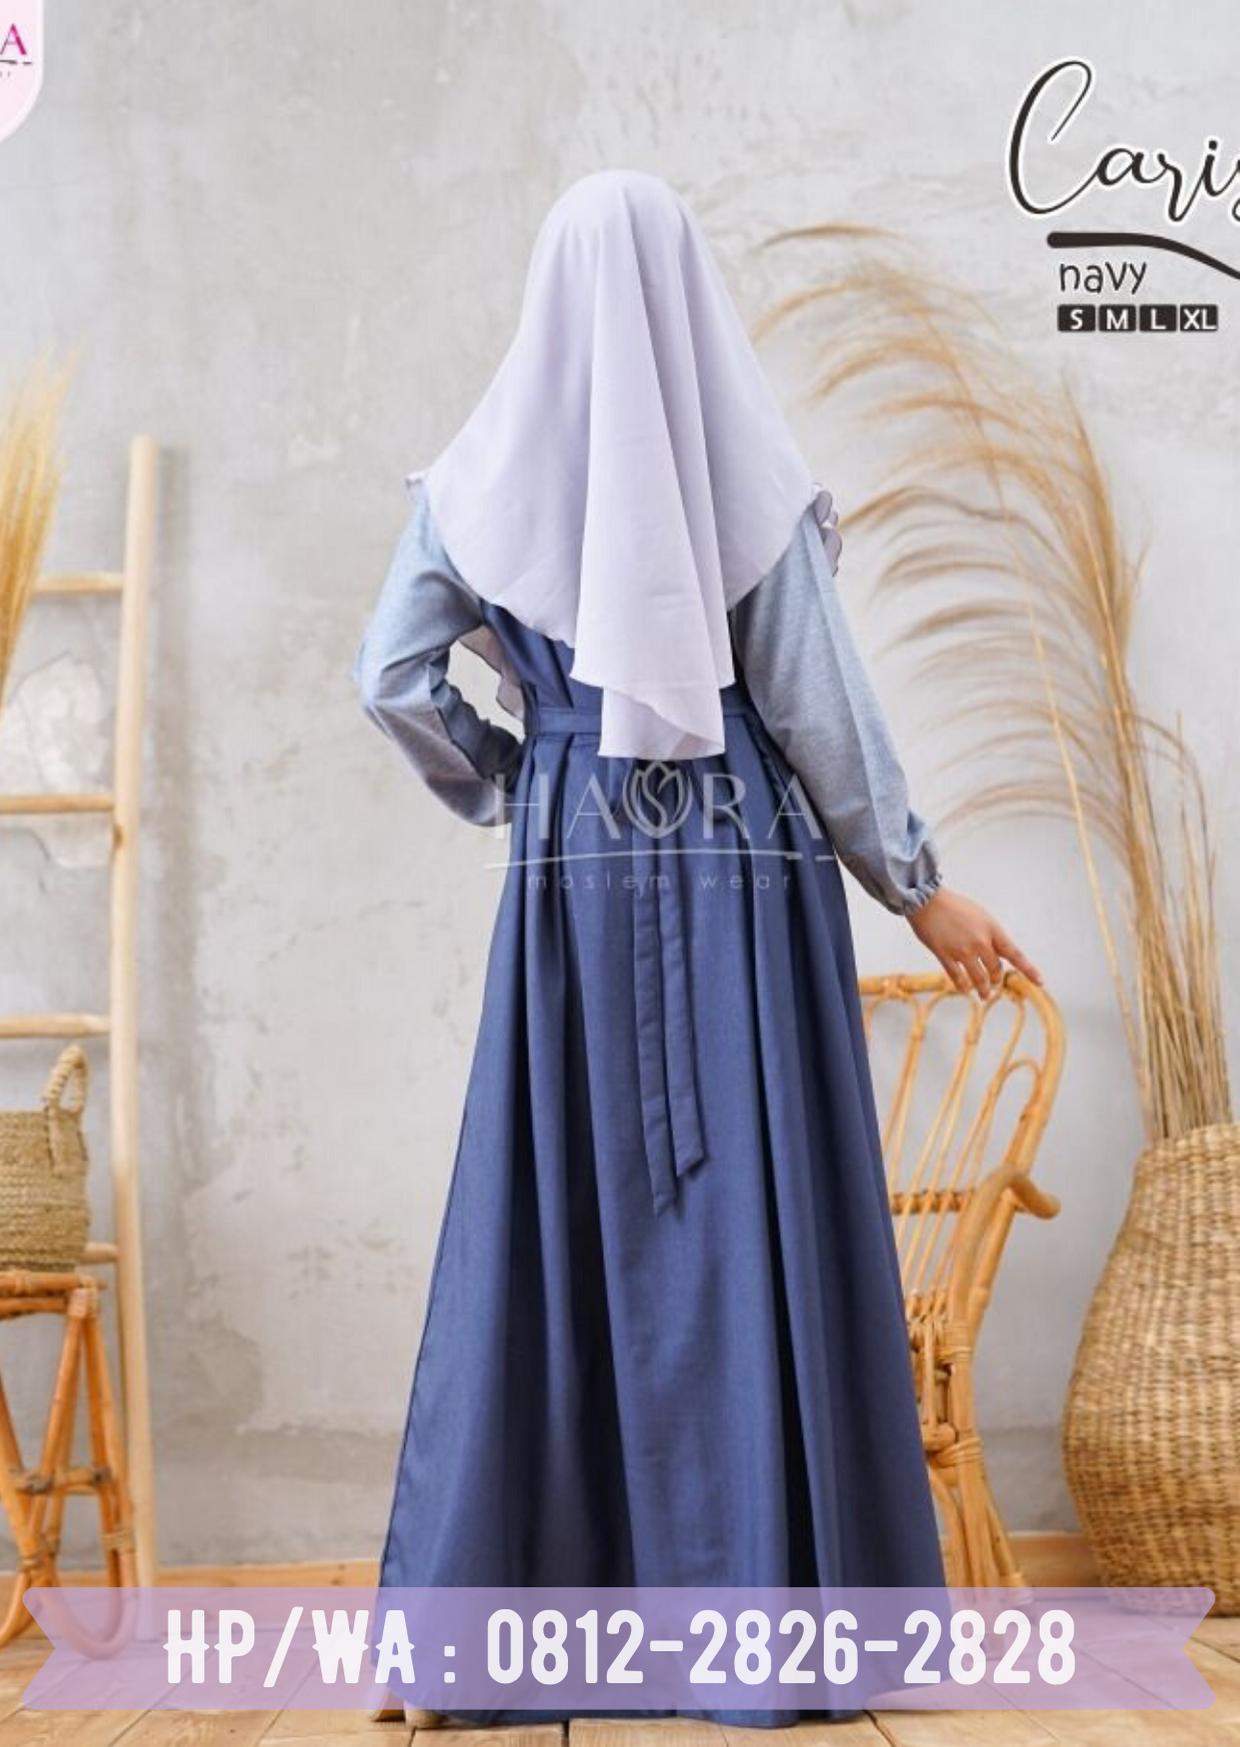 Daftar Agen Hp Wa 0812 2826 2828 Produsen Gamis Tunik Hijab Gorontalo Tunik Hijab Kaftan